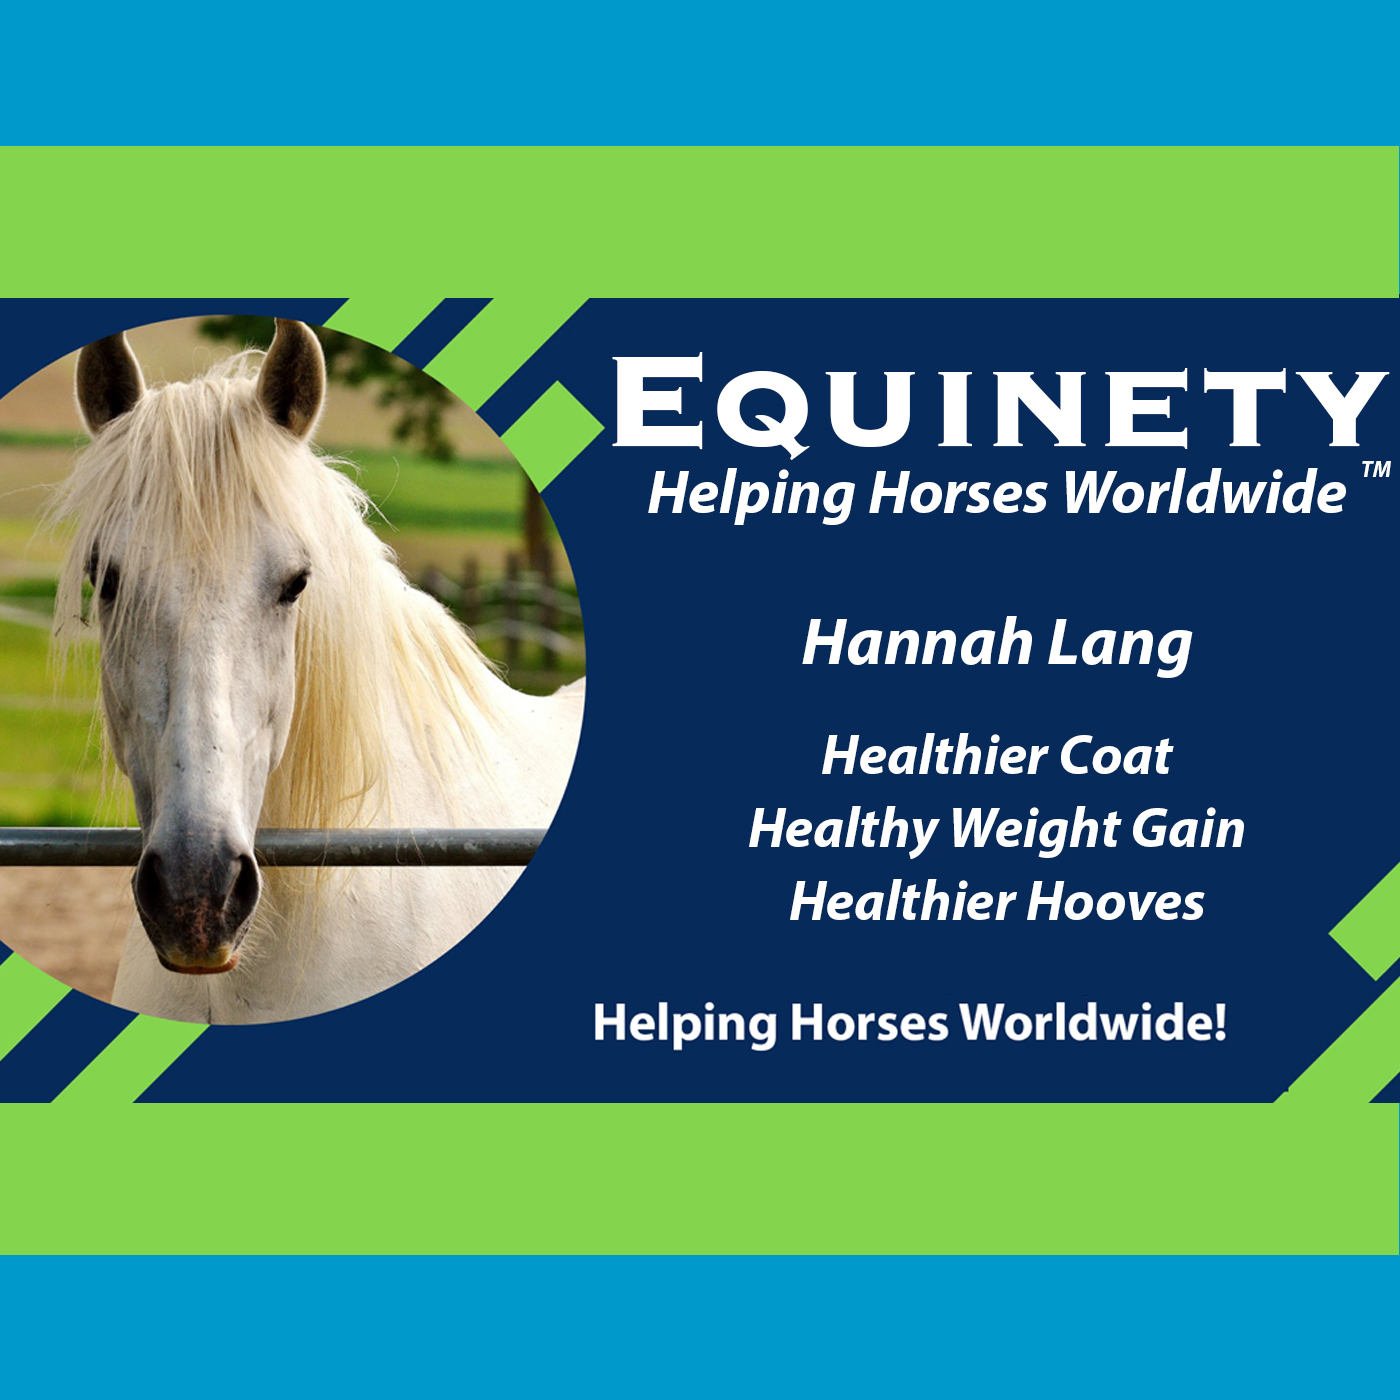 Hannah Lang - Healthier Coat - Healthy Weight Gain - Healthier Hooves